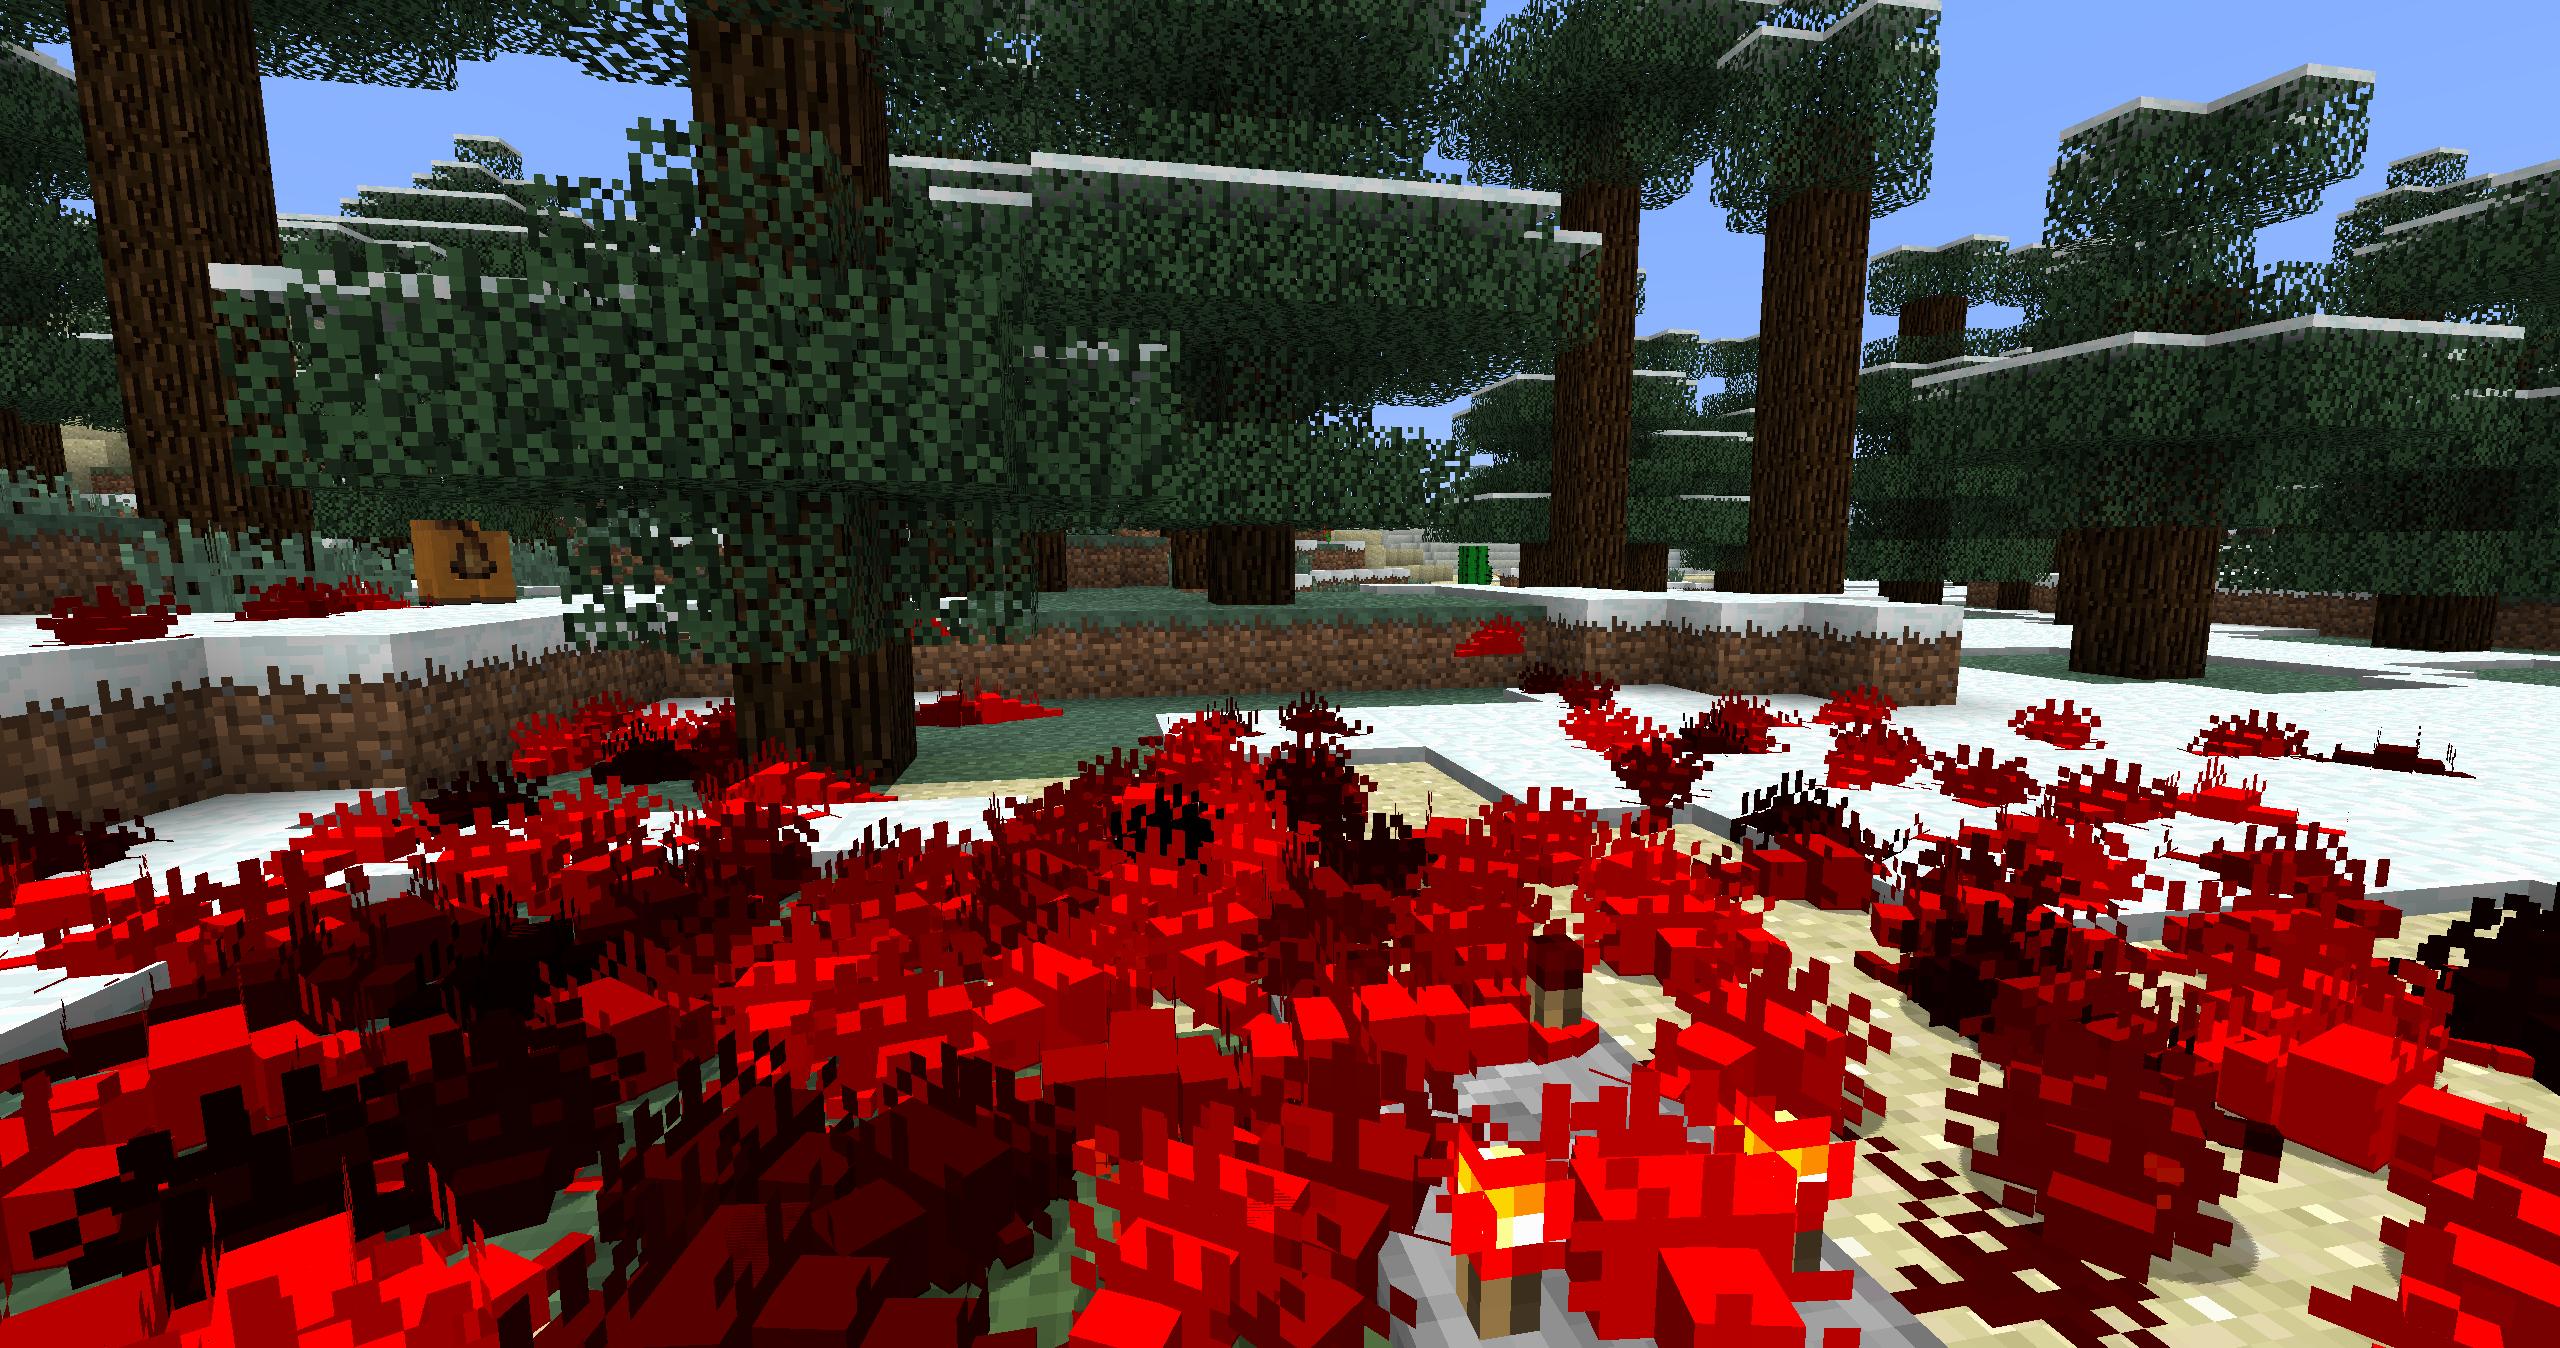 2013 04 04 21.08.58 Minecraft 2.0